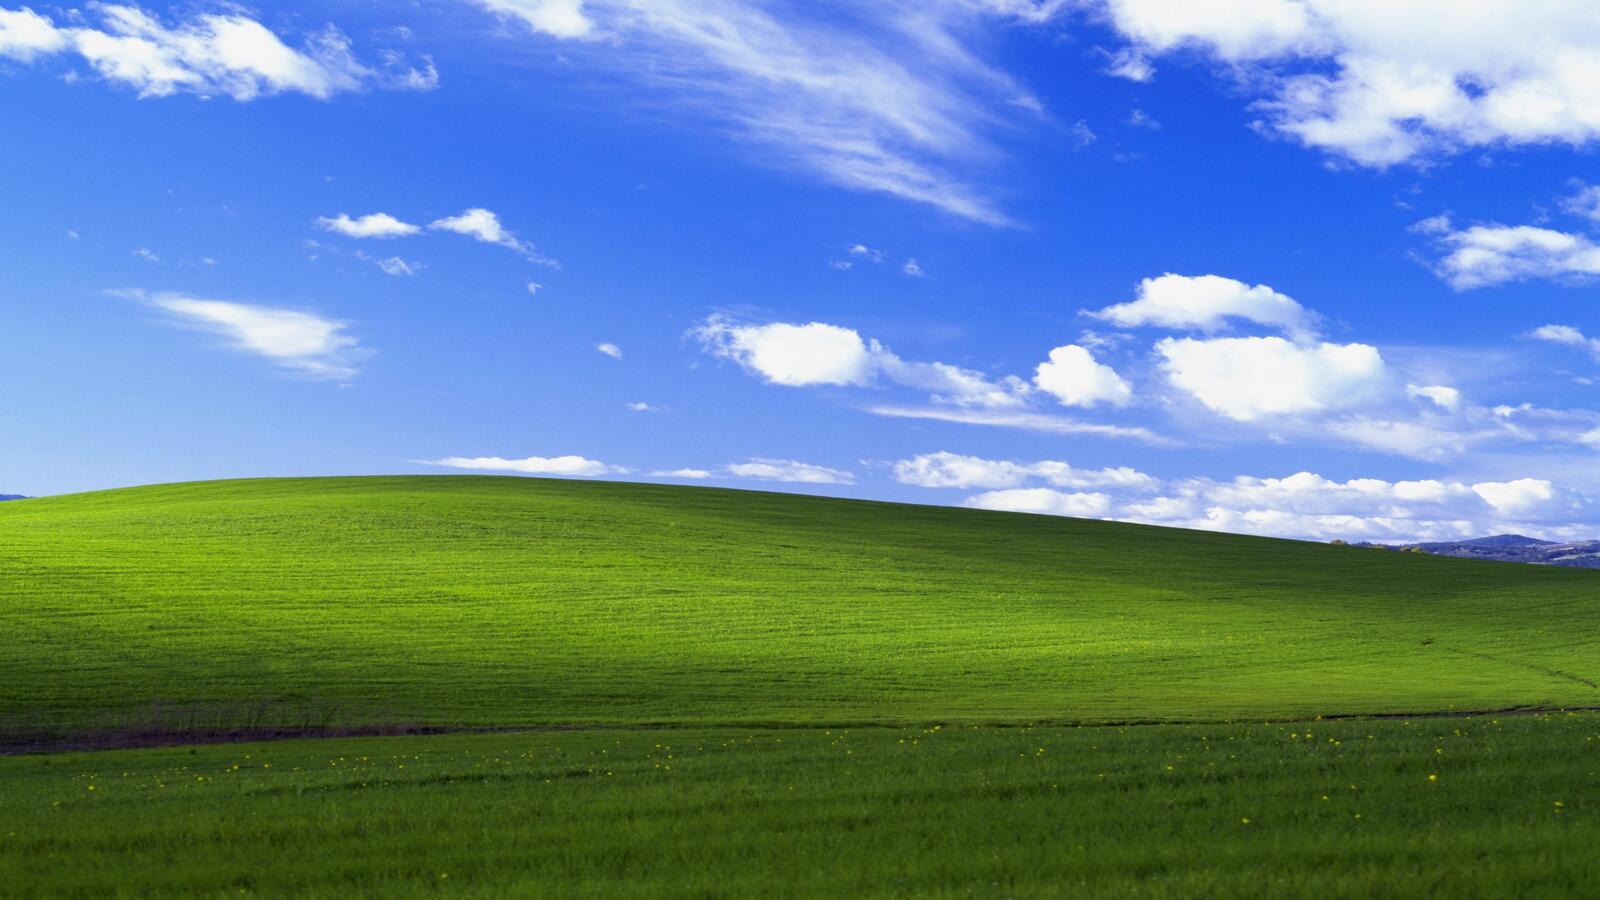 Download 3d Desktop Wallpapers For Windows Xp 1600x900 Windows Xp Bliss 4k 1600x900 Resolution Hd 4k